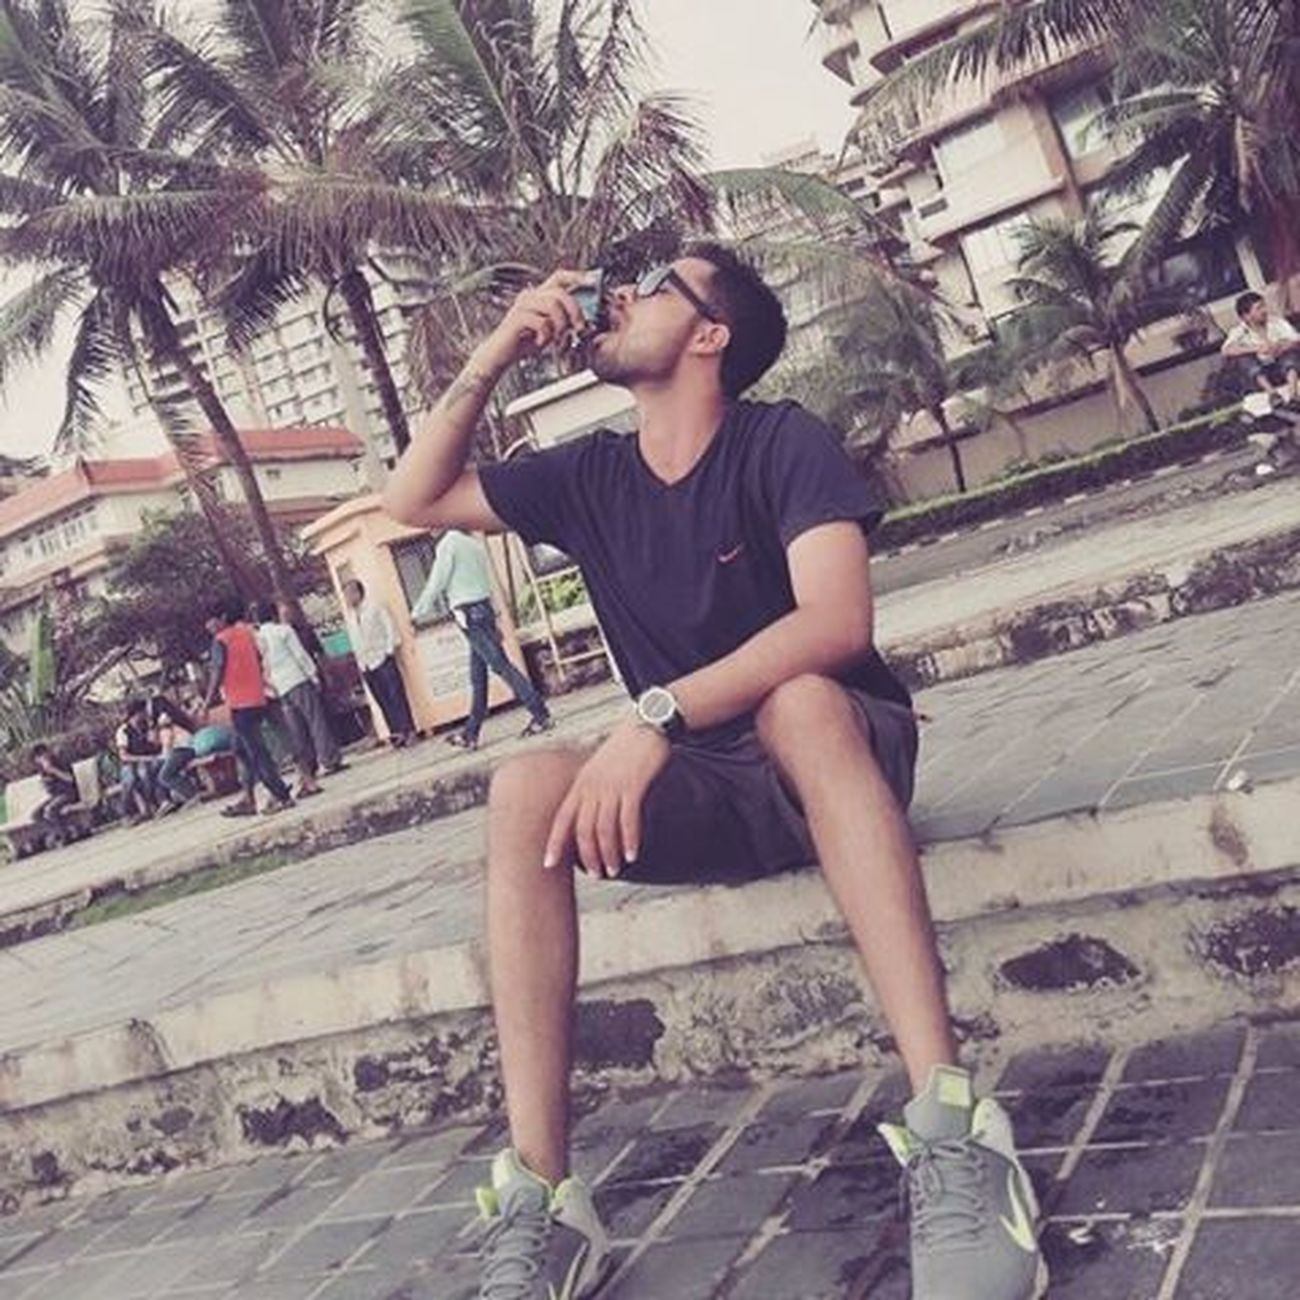 Mumbai Bandstand Mannat Srk Holidays Trip Nike Lovenike Fastrack Masti Funtimes Sony Trees